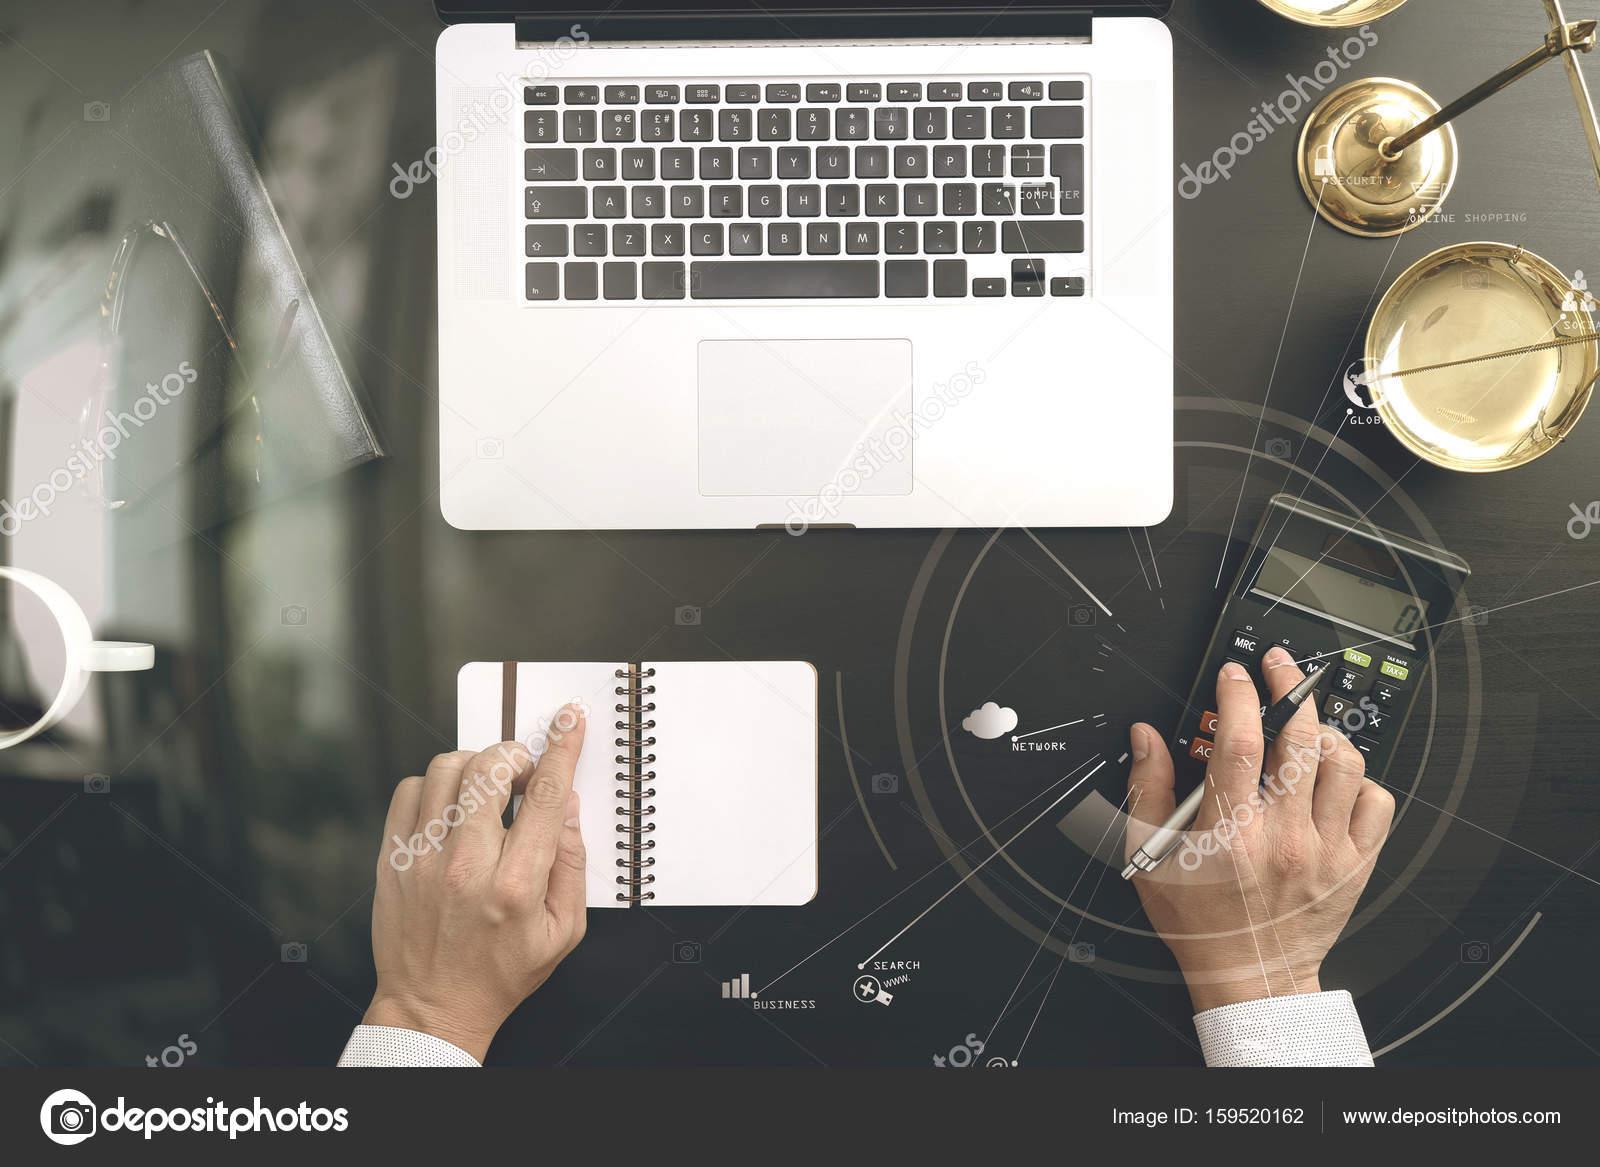 Онлайн бухгалтер юрист бухгалтерское обслуживание киеве